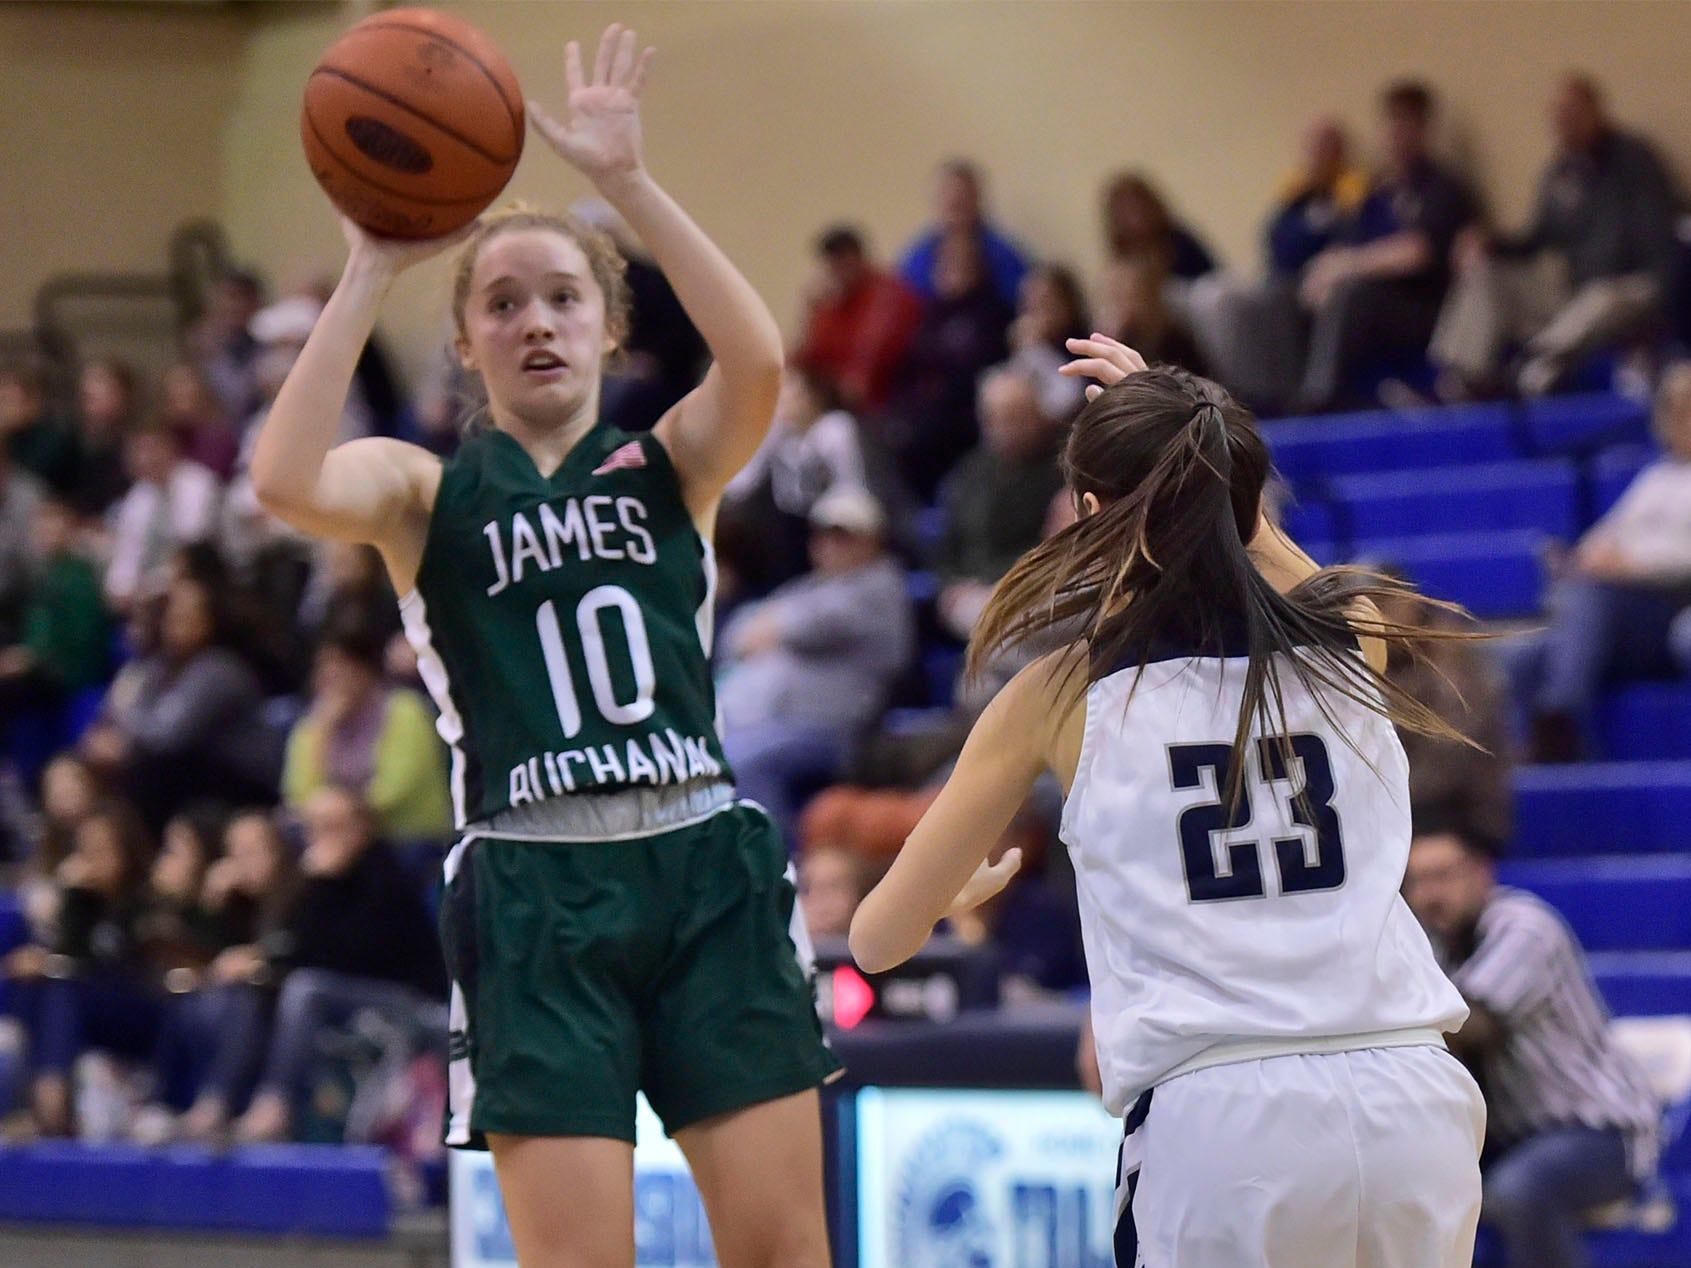 James Buchanan's Reilly Heinbaugh (10) fires up a shot. Chambersburg played James Buchanan girls during the Franklin County Tip-Off Tournament, Friday, Dec. 7, 2018.